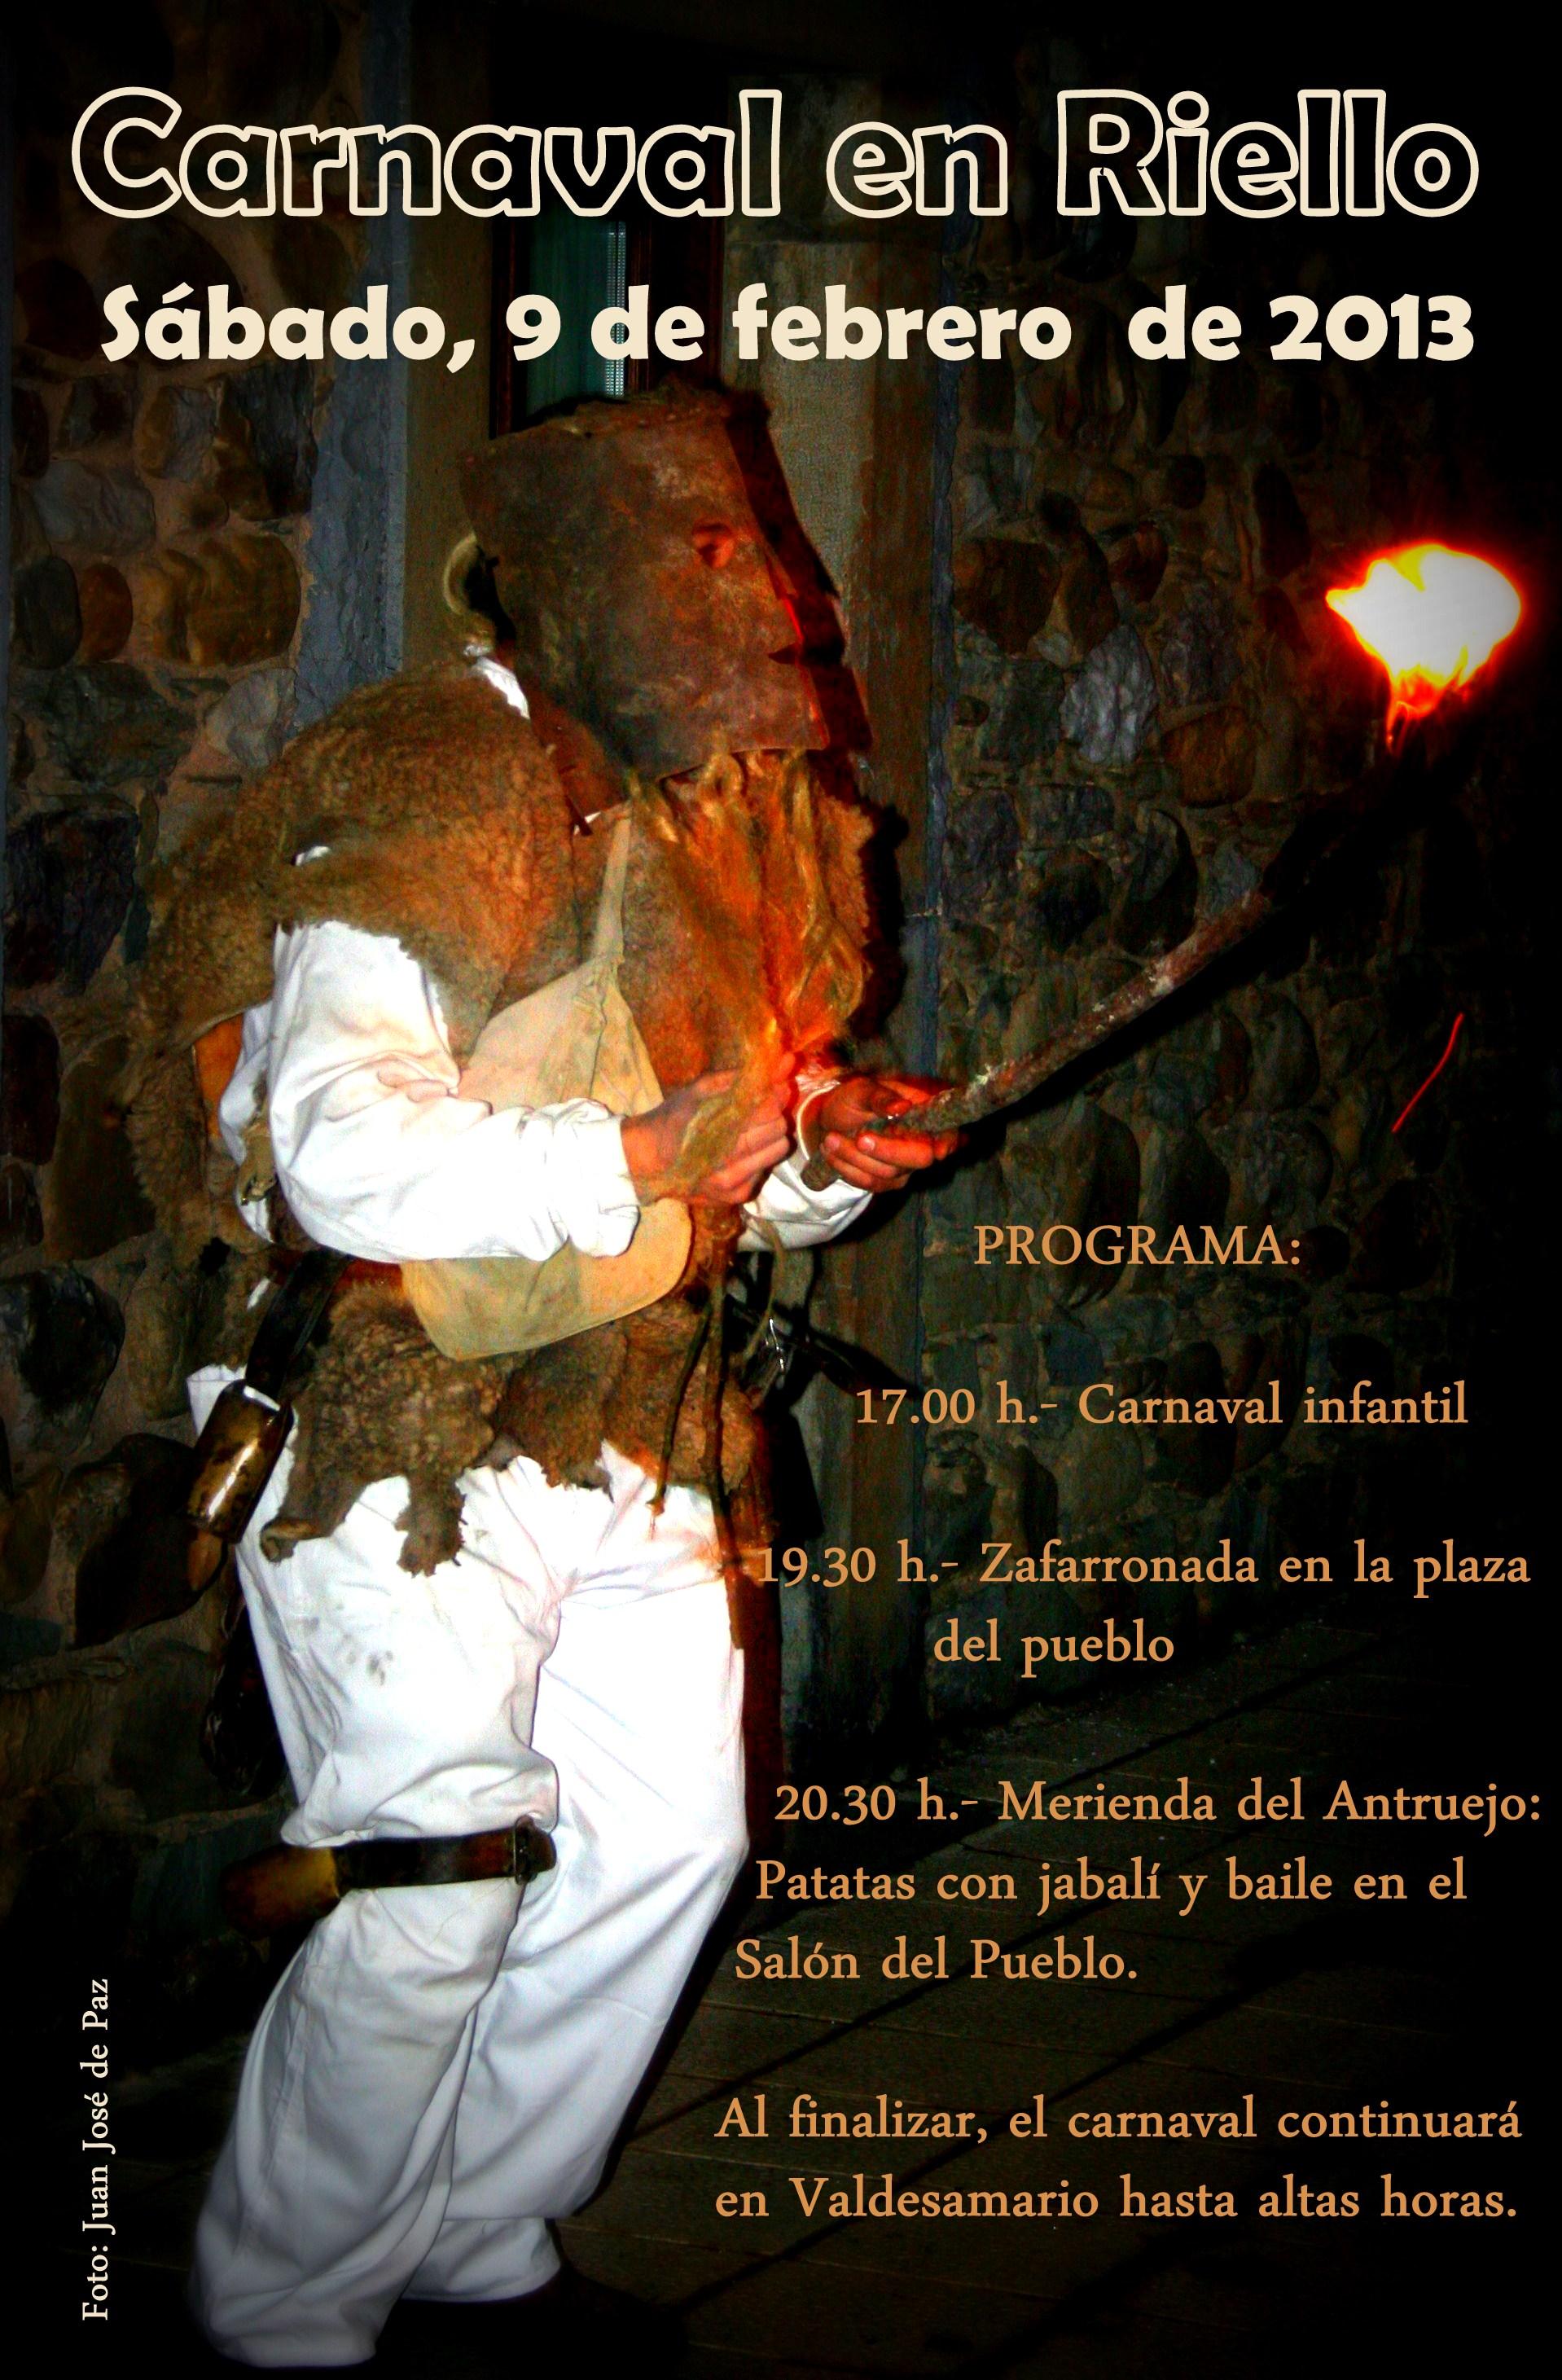 Cartel Carnavales Riello 2013